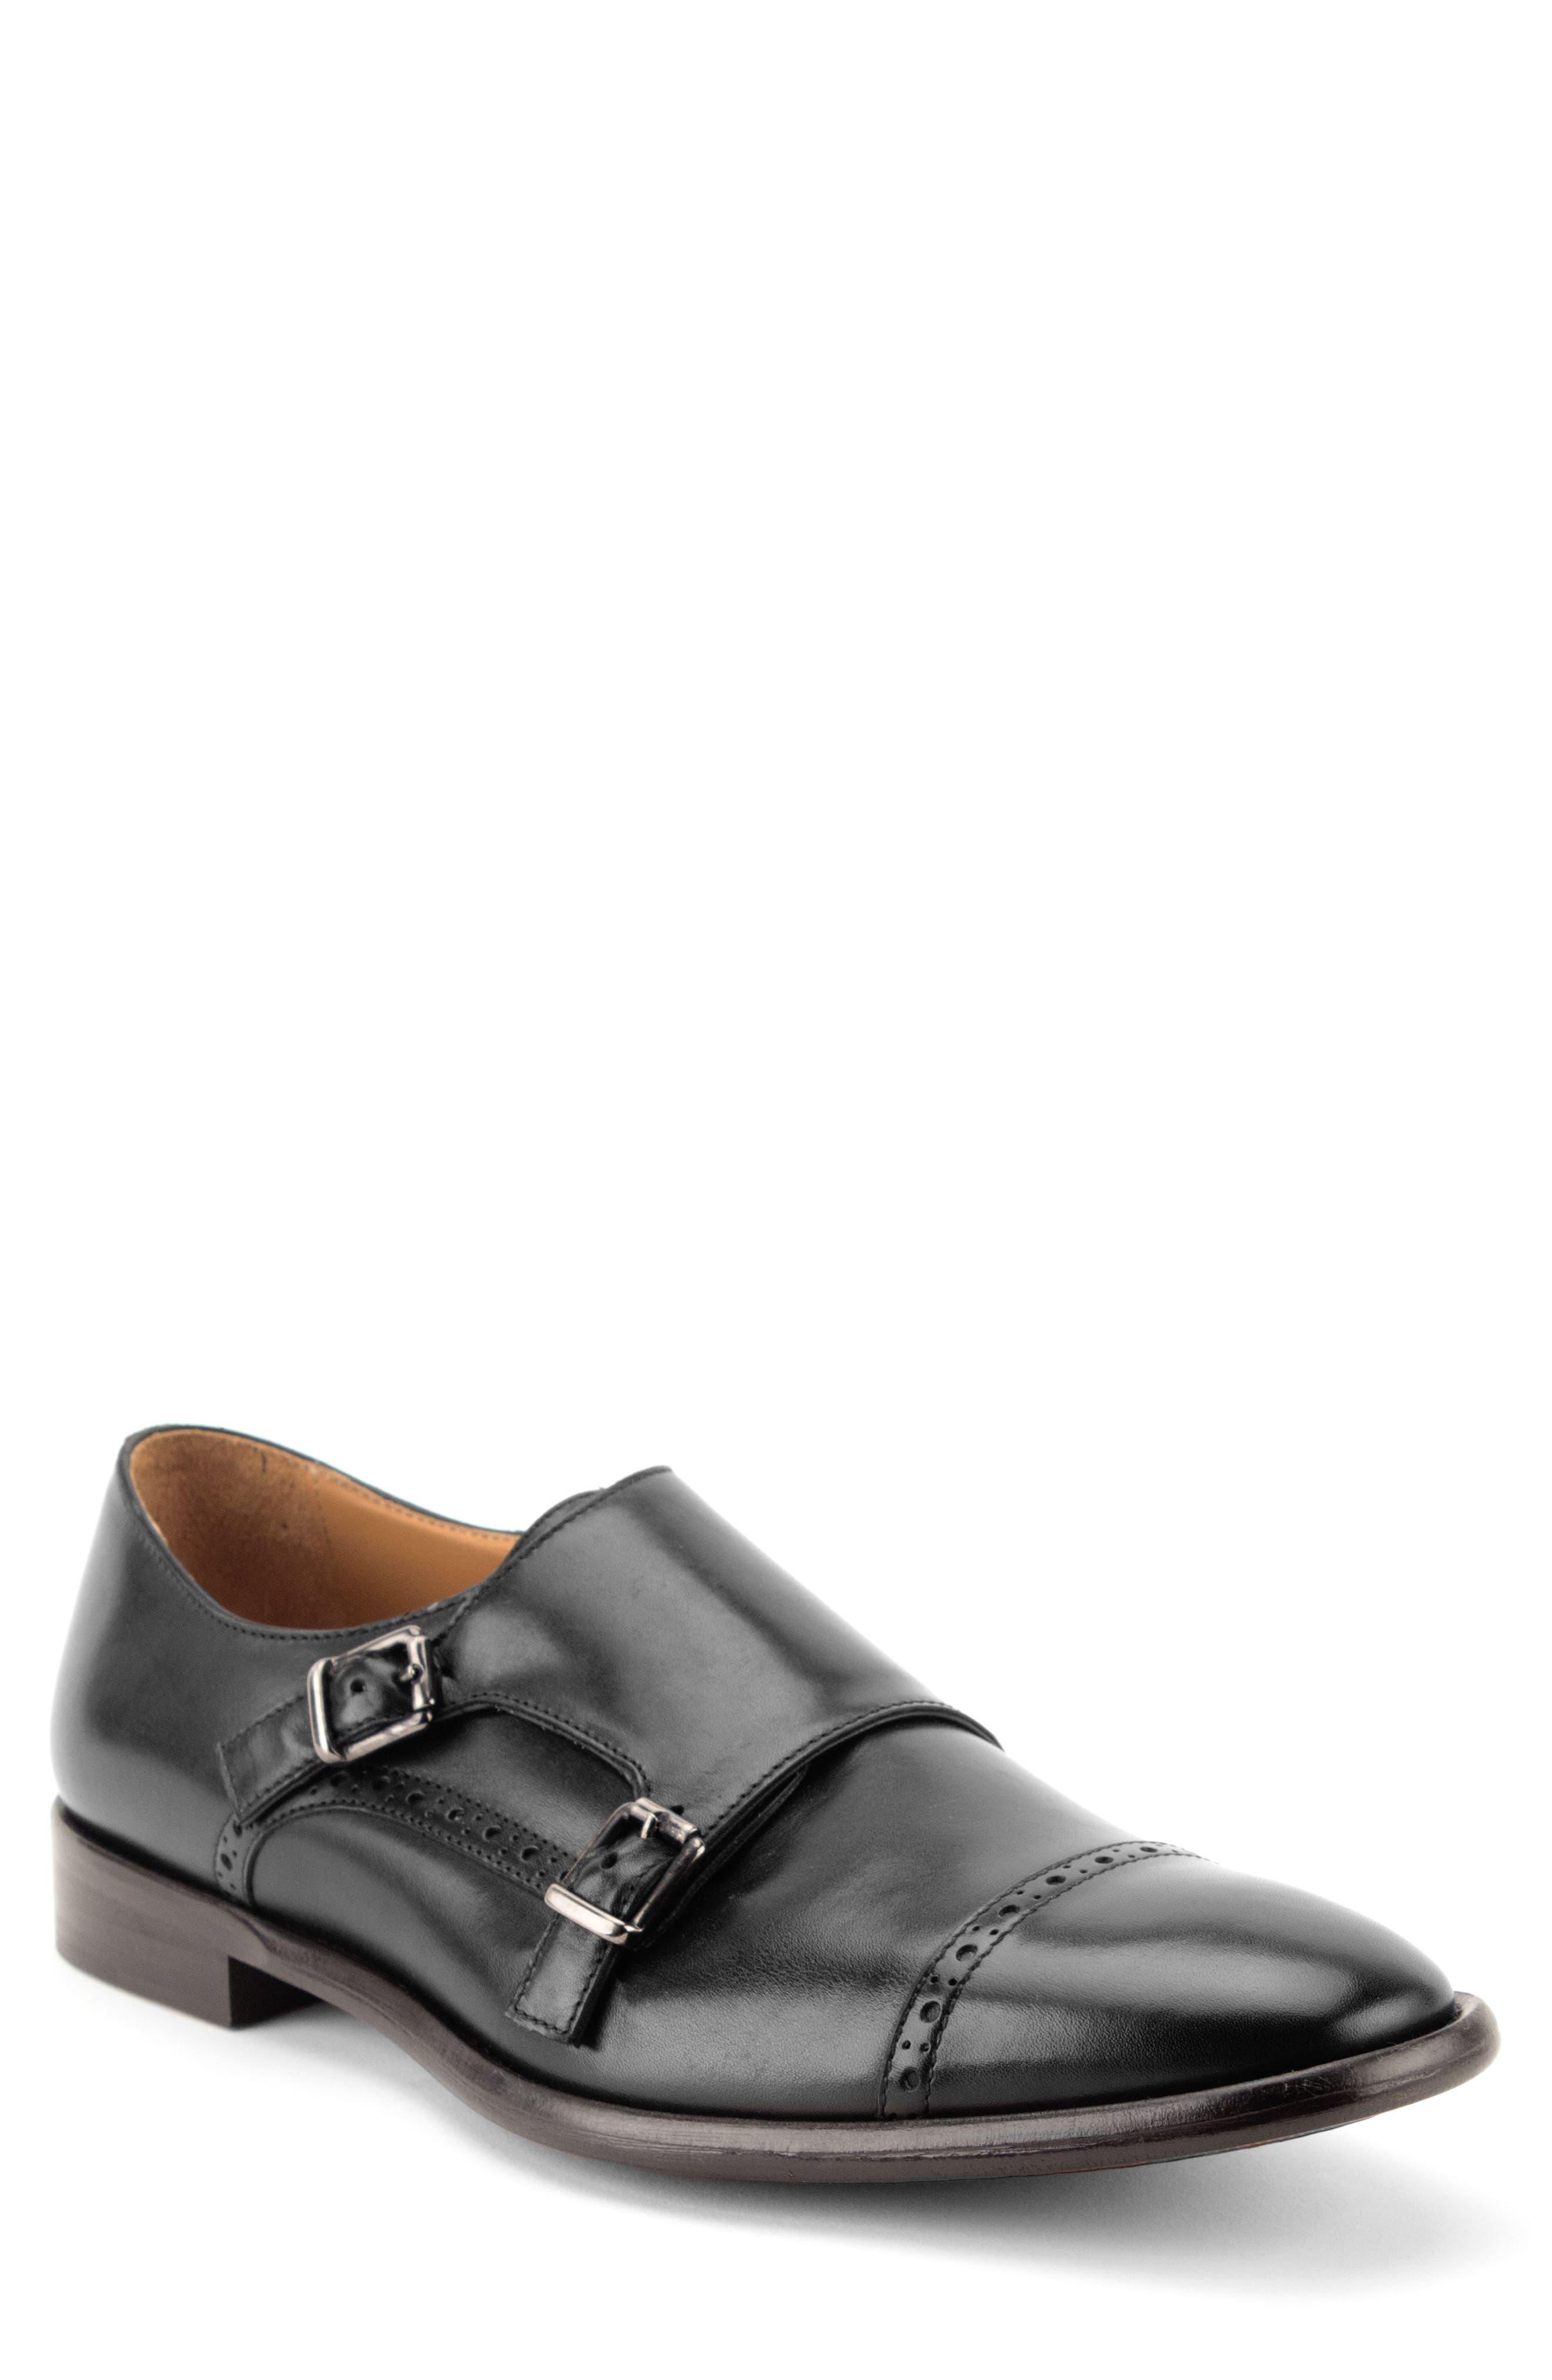 Corbett Cap Toe Double Strap Monk Shoe, Main, color, 001